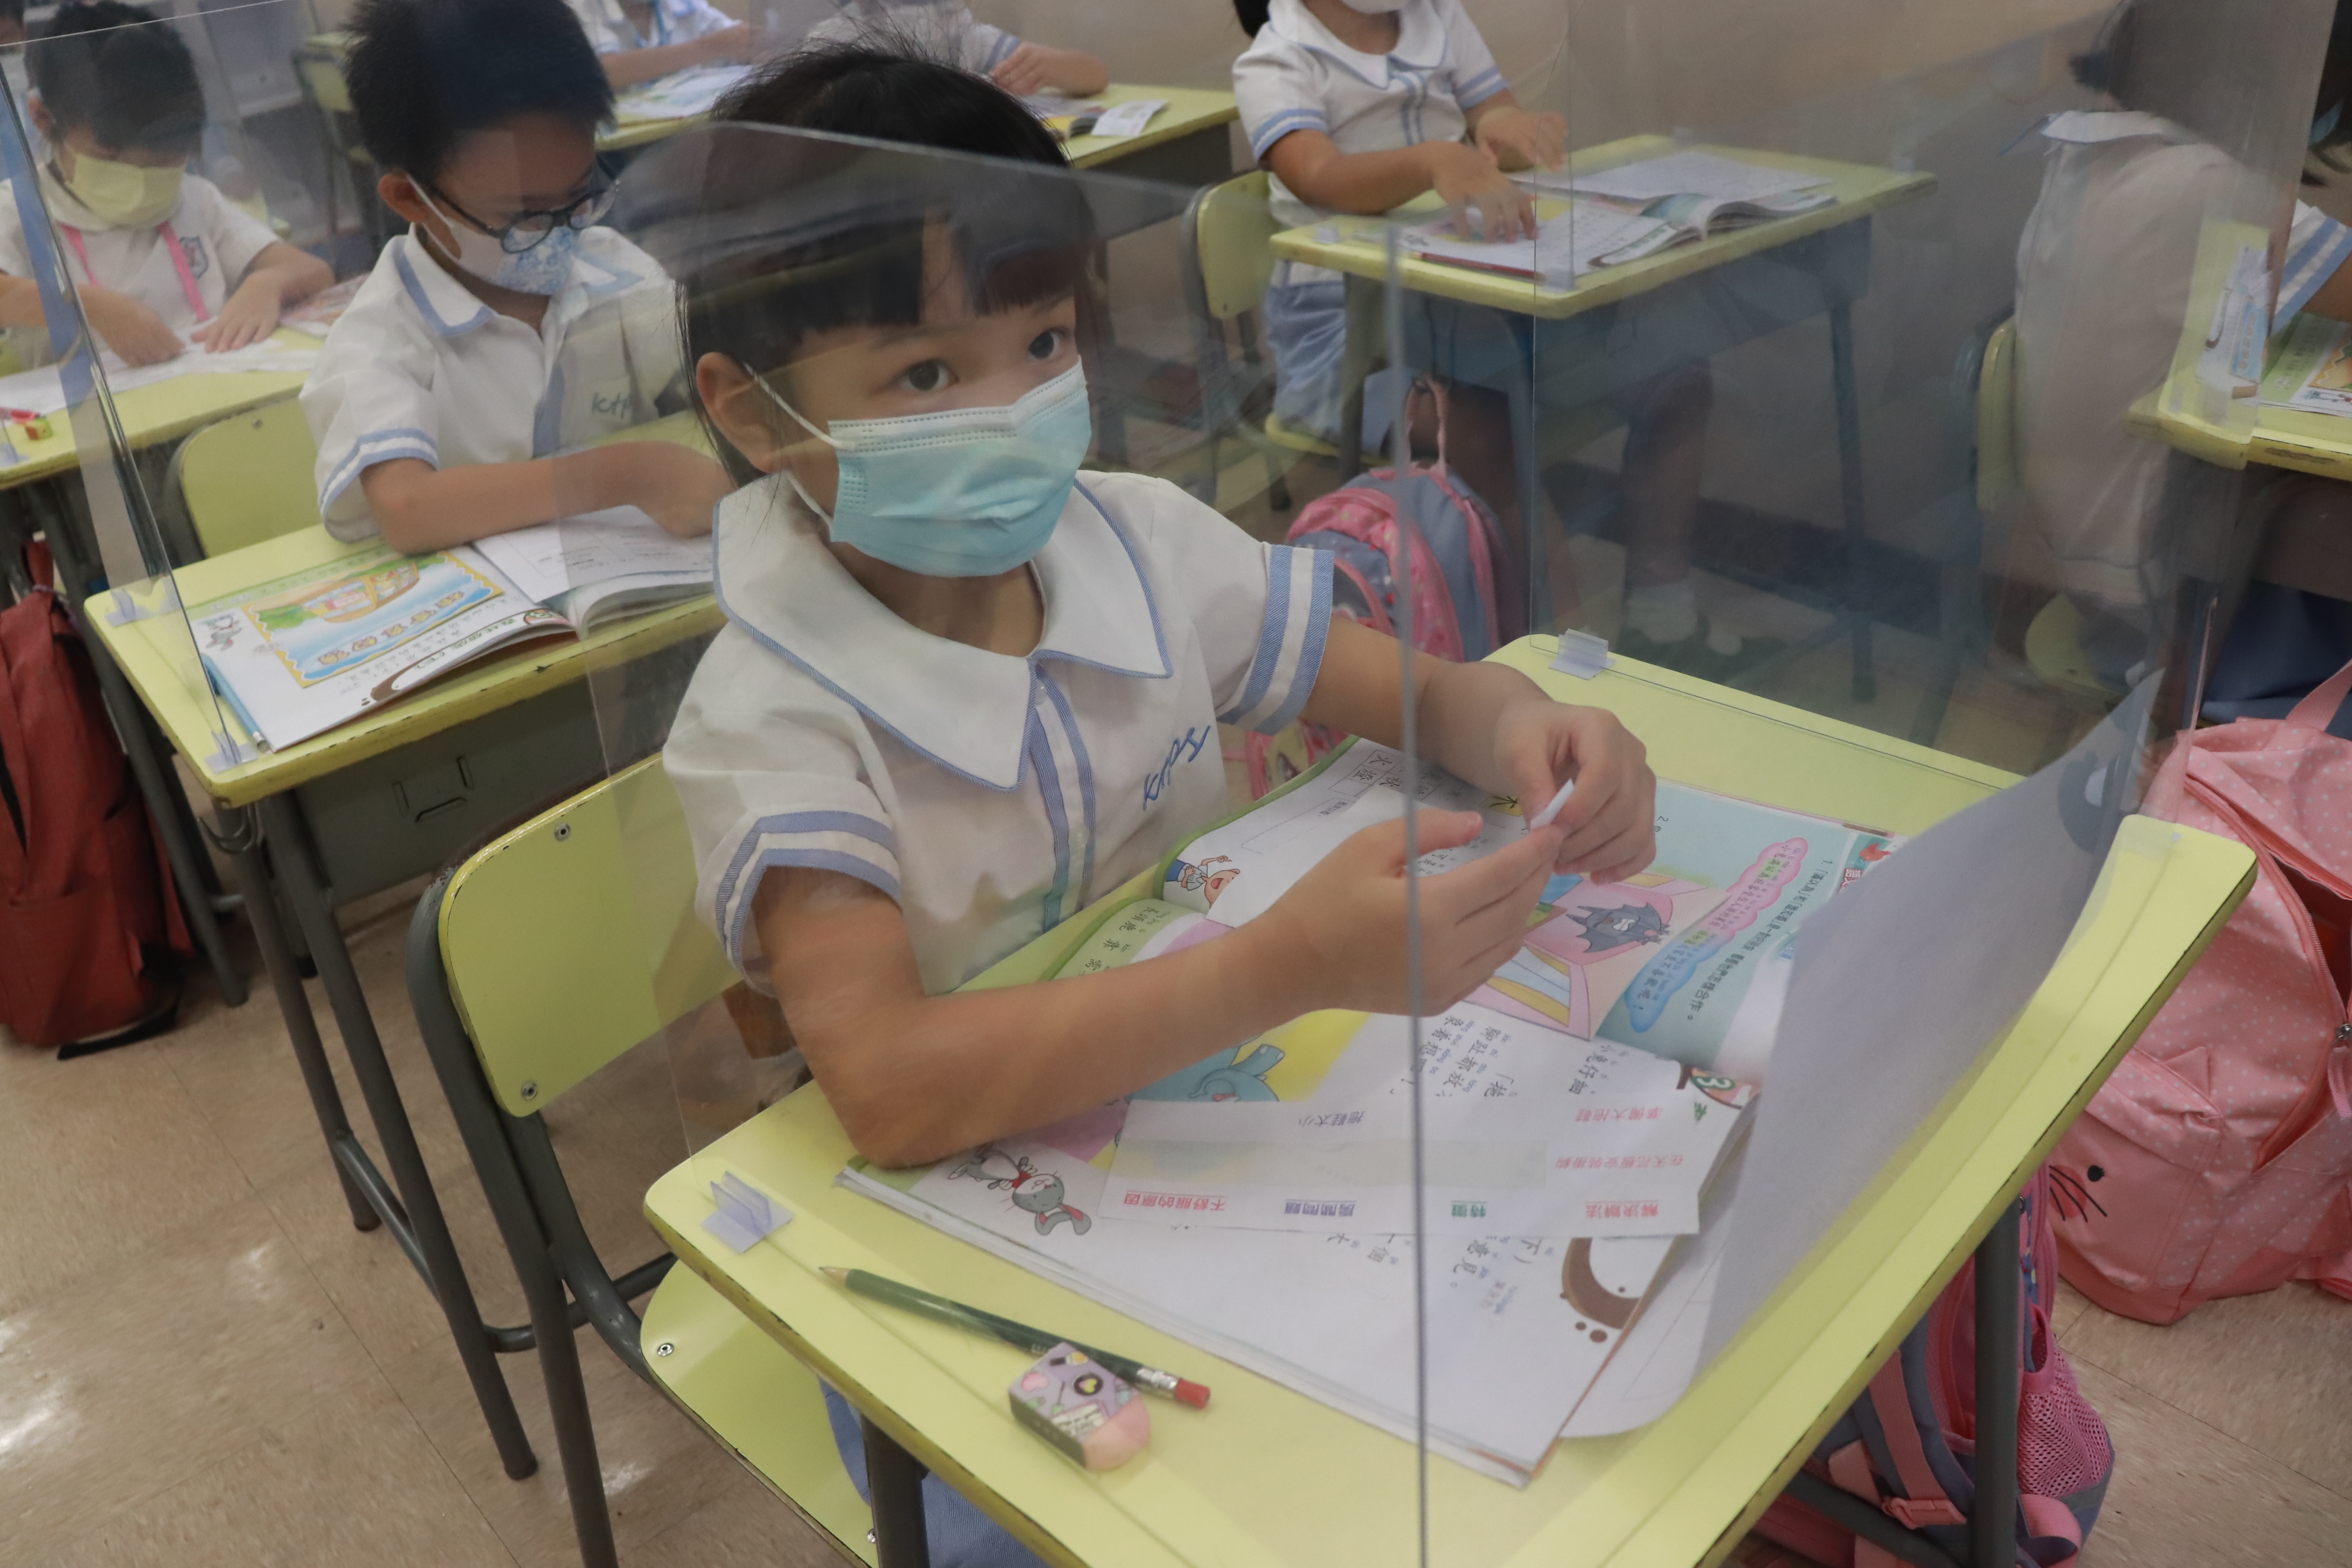 http://keito.school.hk/sites/default/files/img_6514.jpg